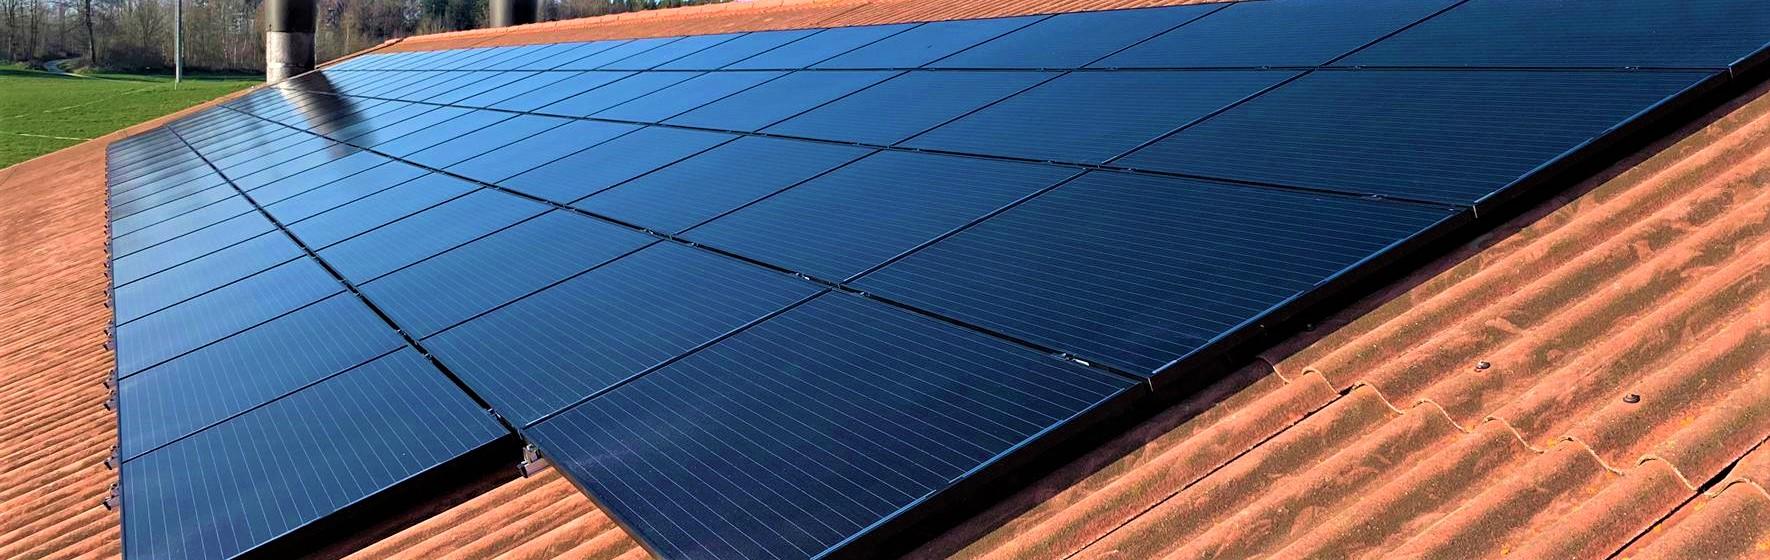 stg energy photovoltaïque